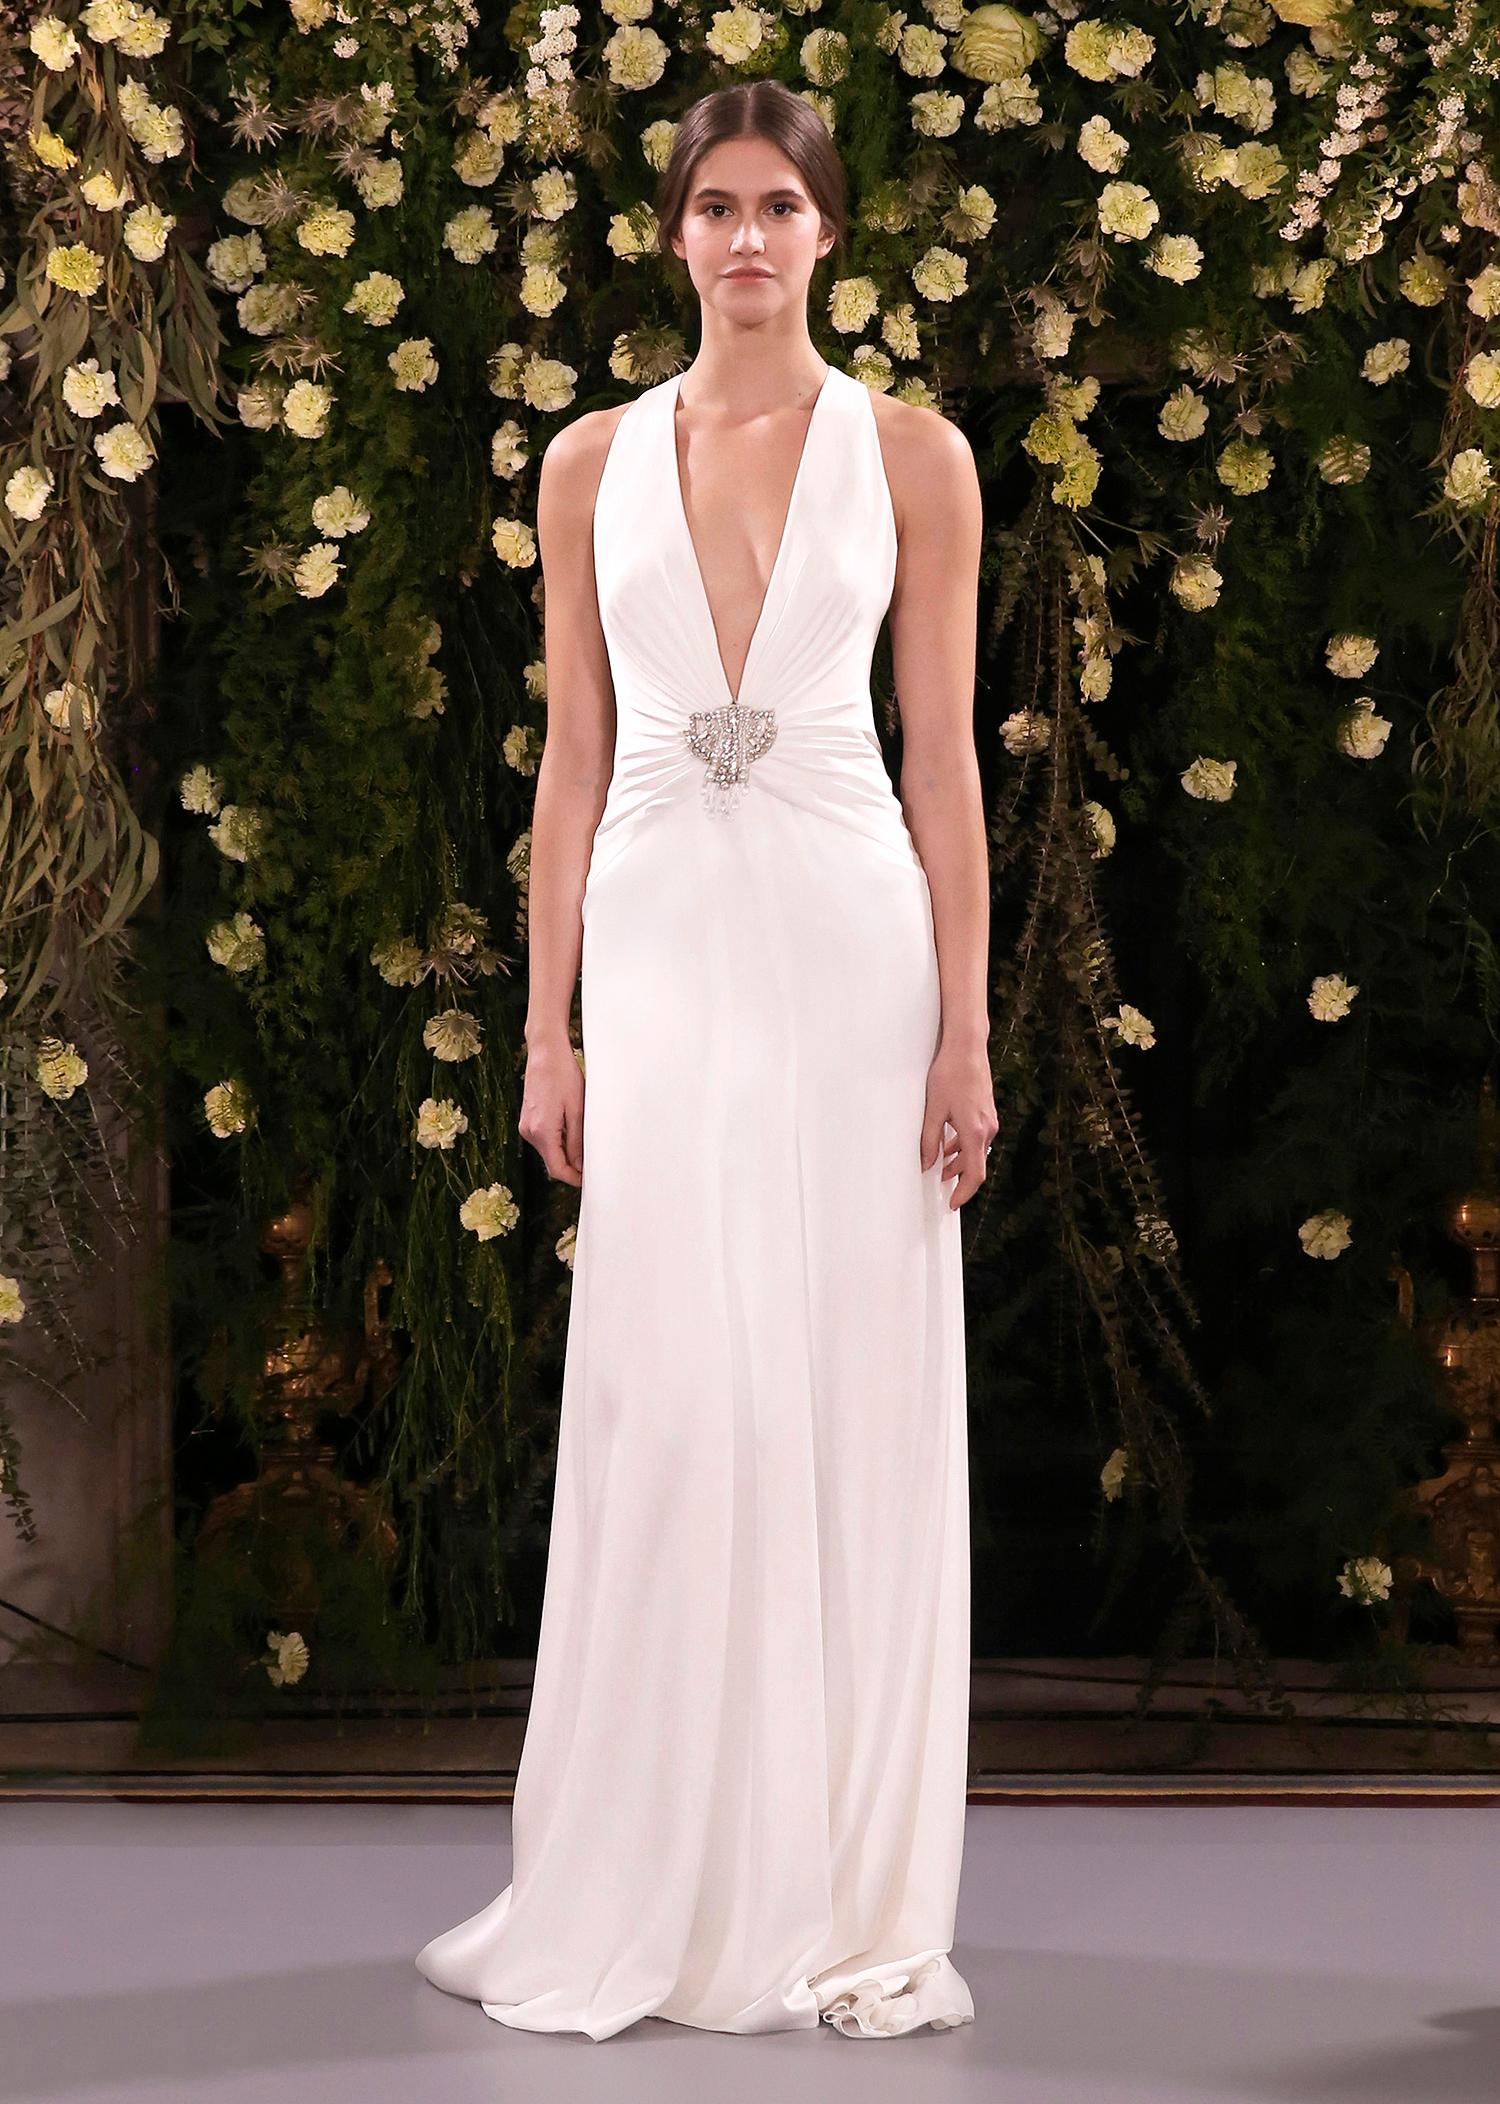 jenny packham wedding dress spring 2019 deep v-neck with front embellishment